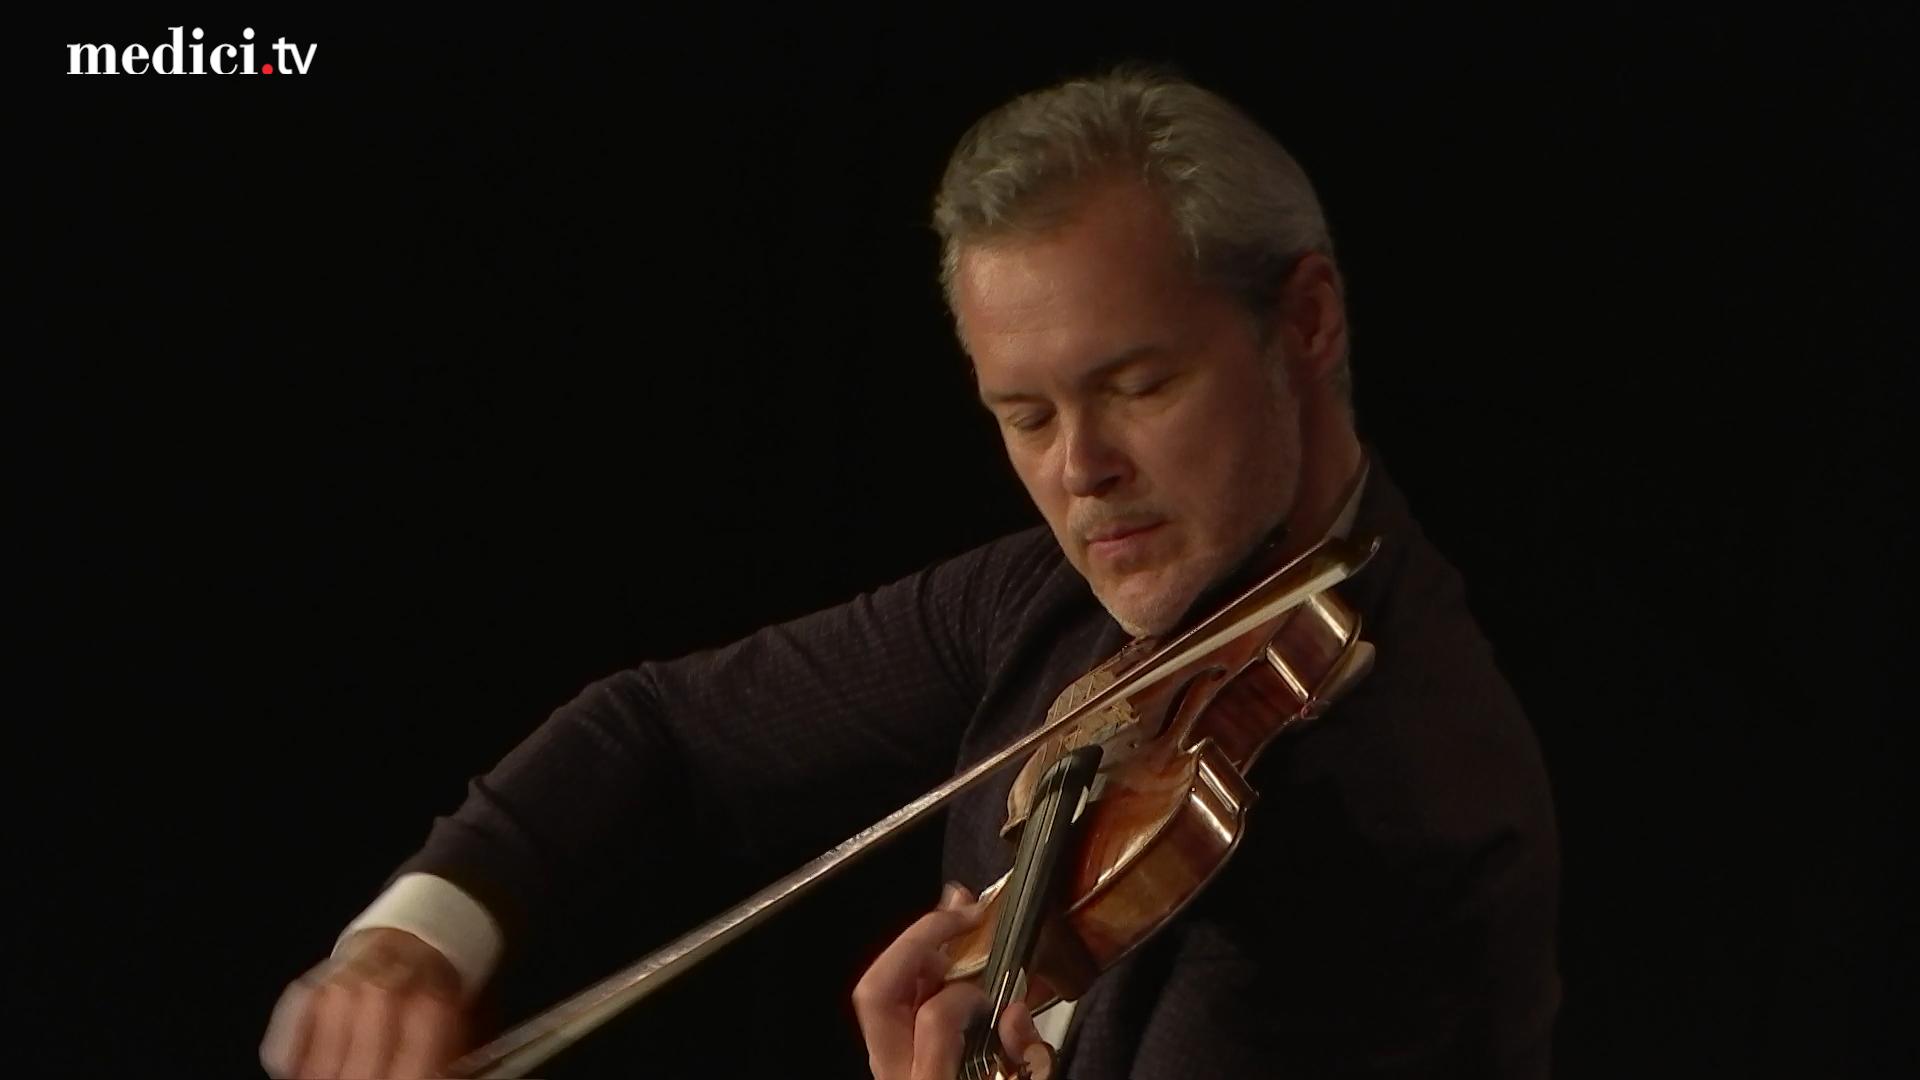 Vadim Repin et Andrei Korobeinikov interprètent Grieg et Prokofiev